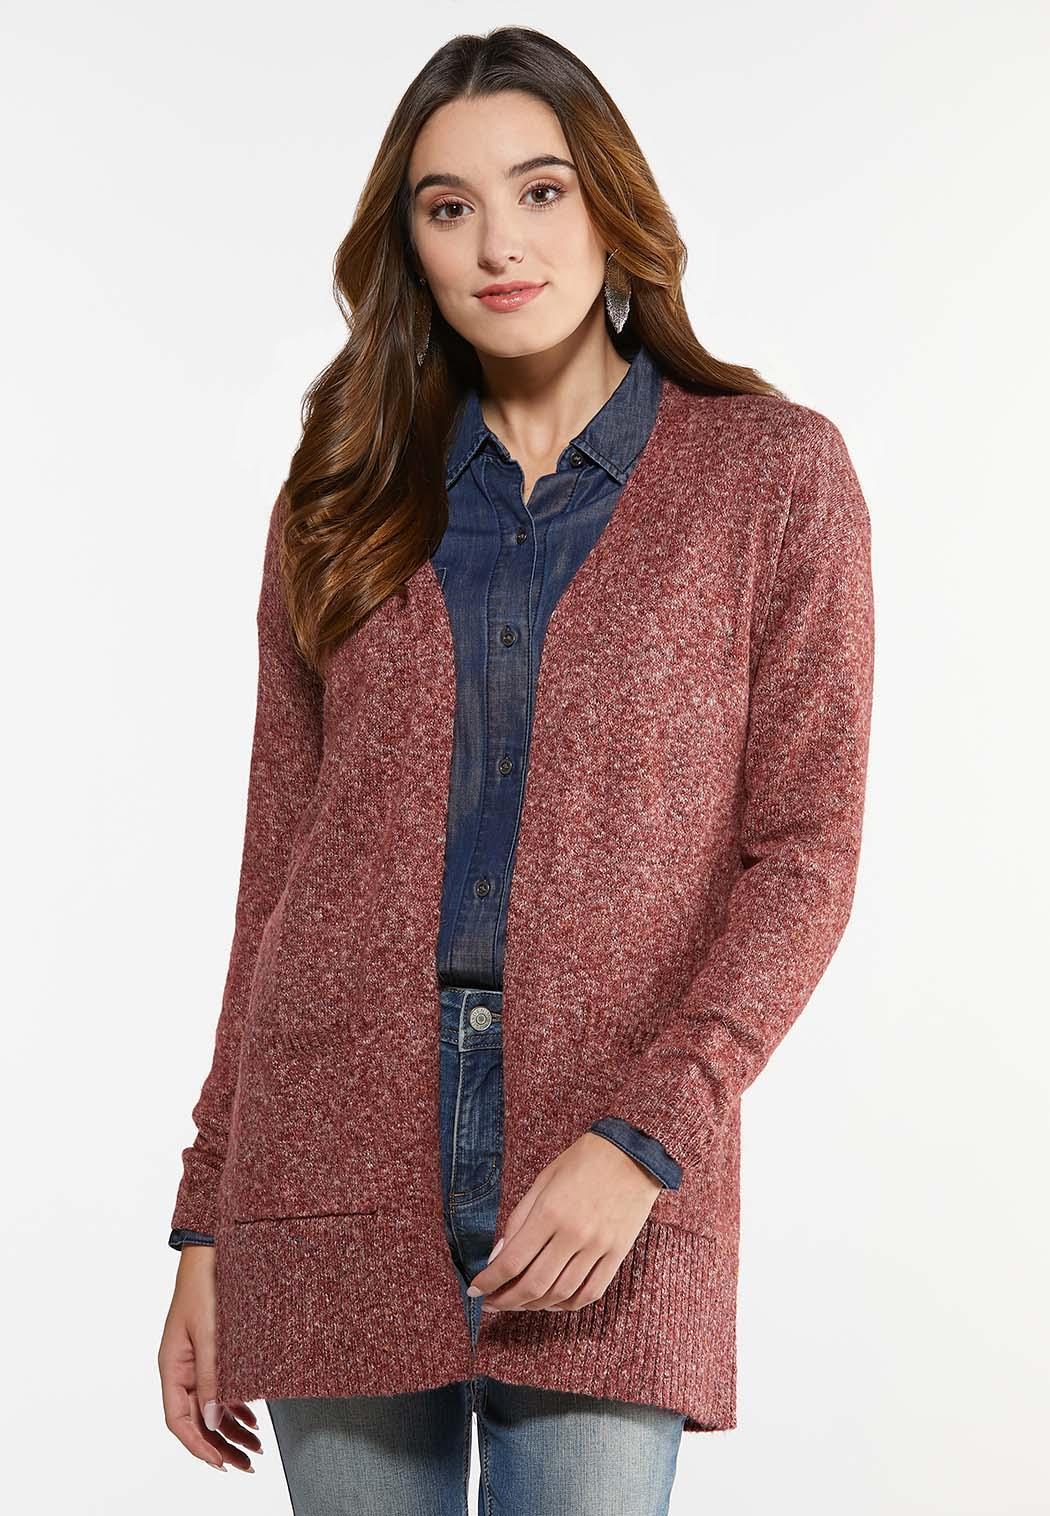 Plus Size Space Dye Cardigan Sweater